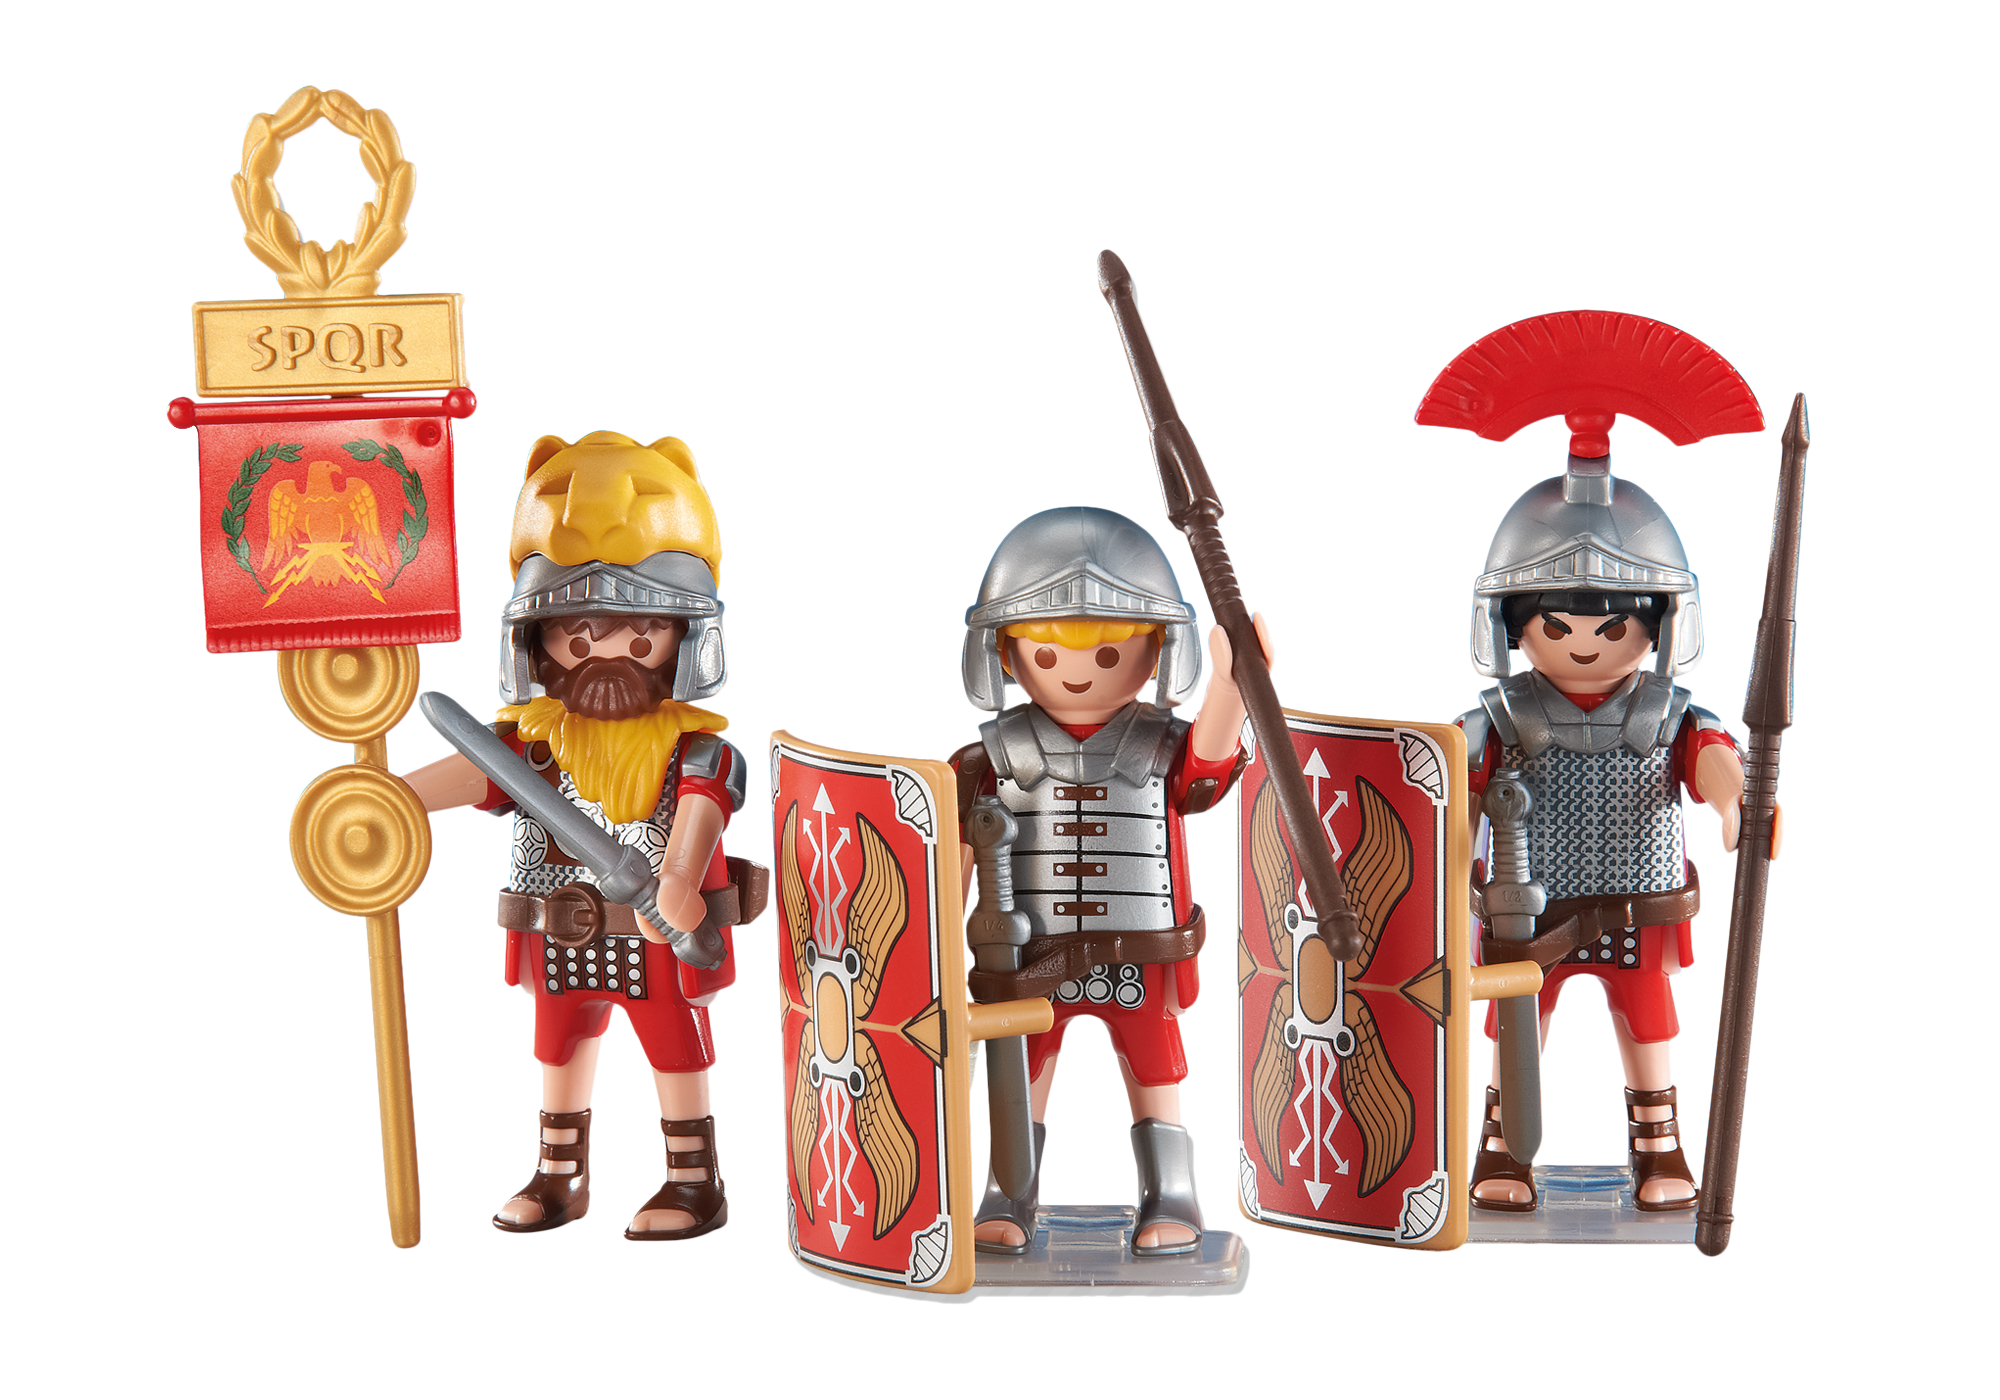 http://media.playmobil.com/i/playmobil/6490_product_detail/3 römische Soldaten